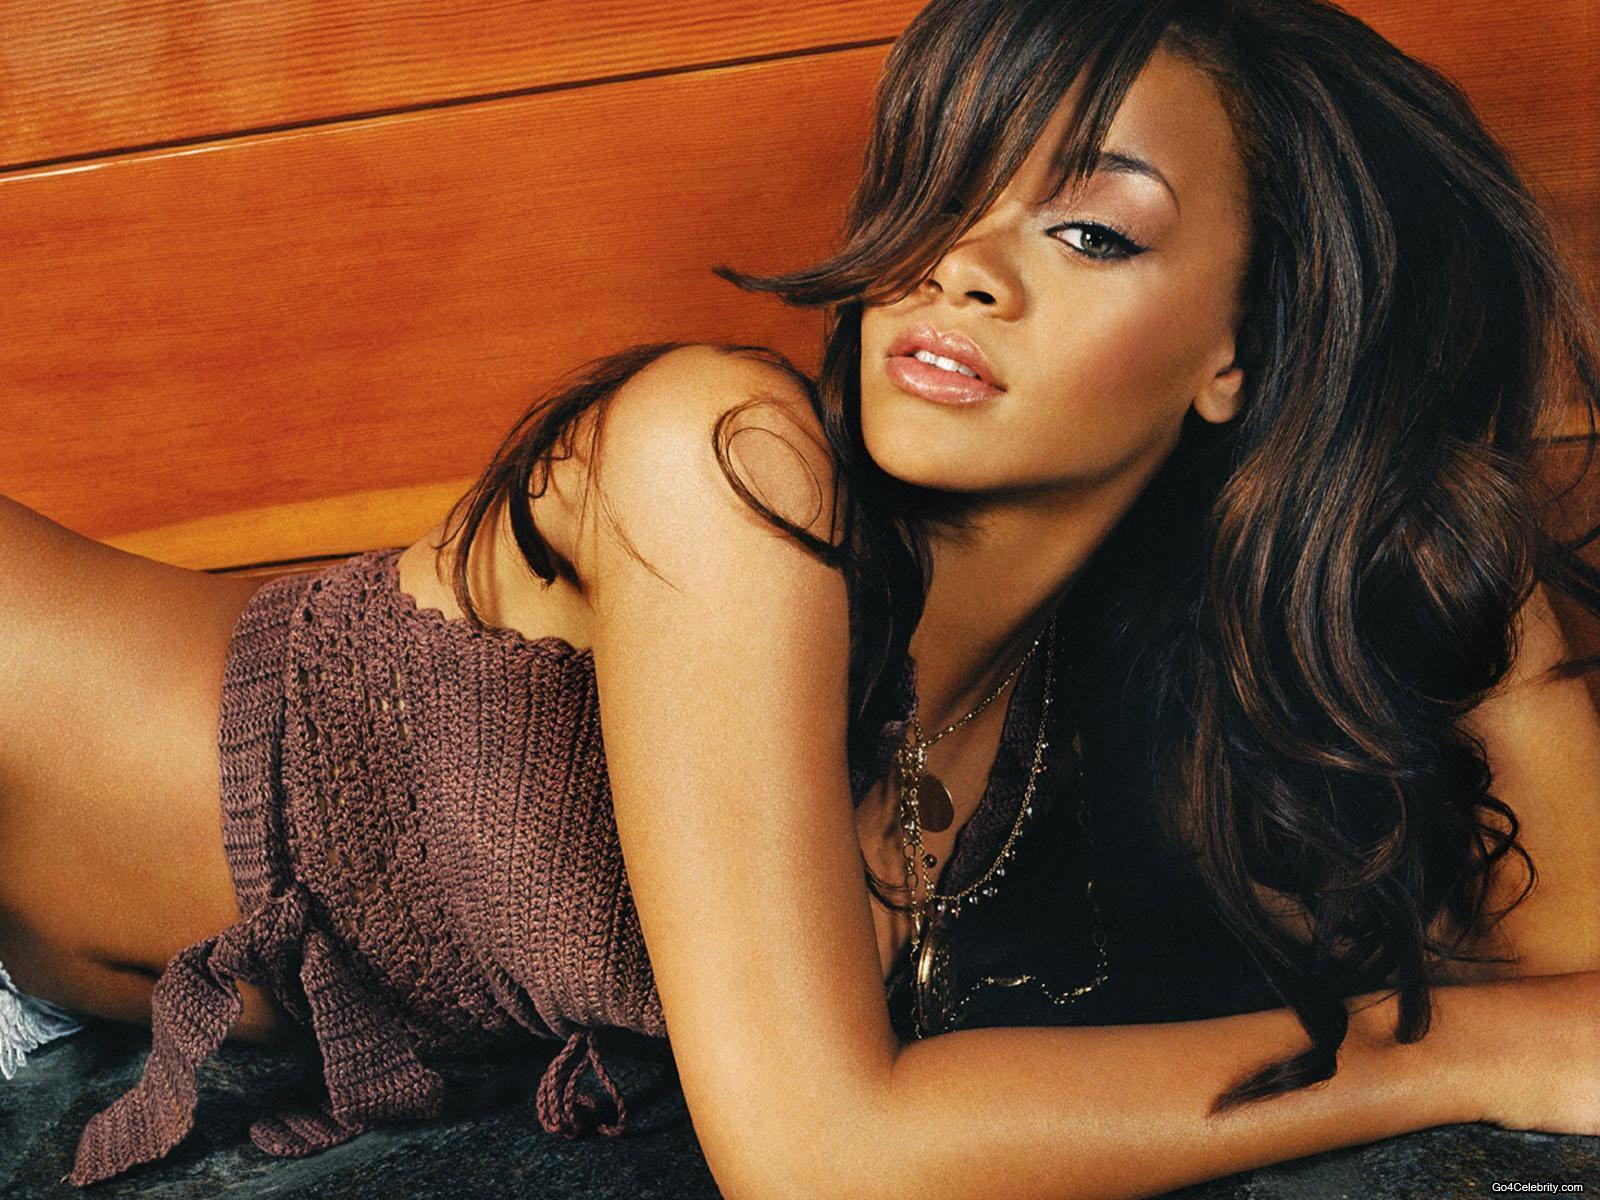 Rihanna: Rihanna - Get It Over With - Traduzione Testo Video